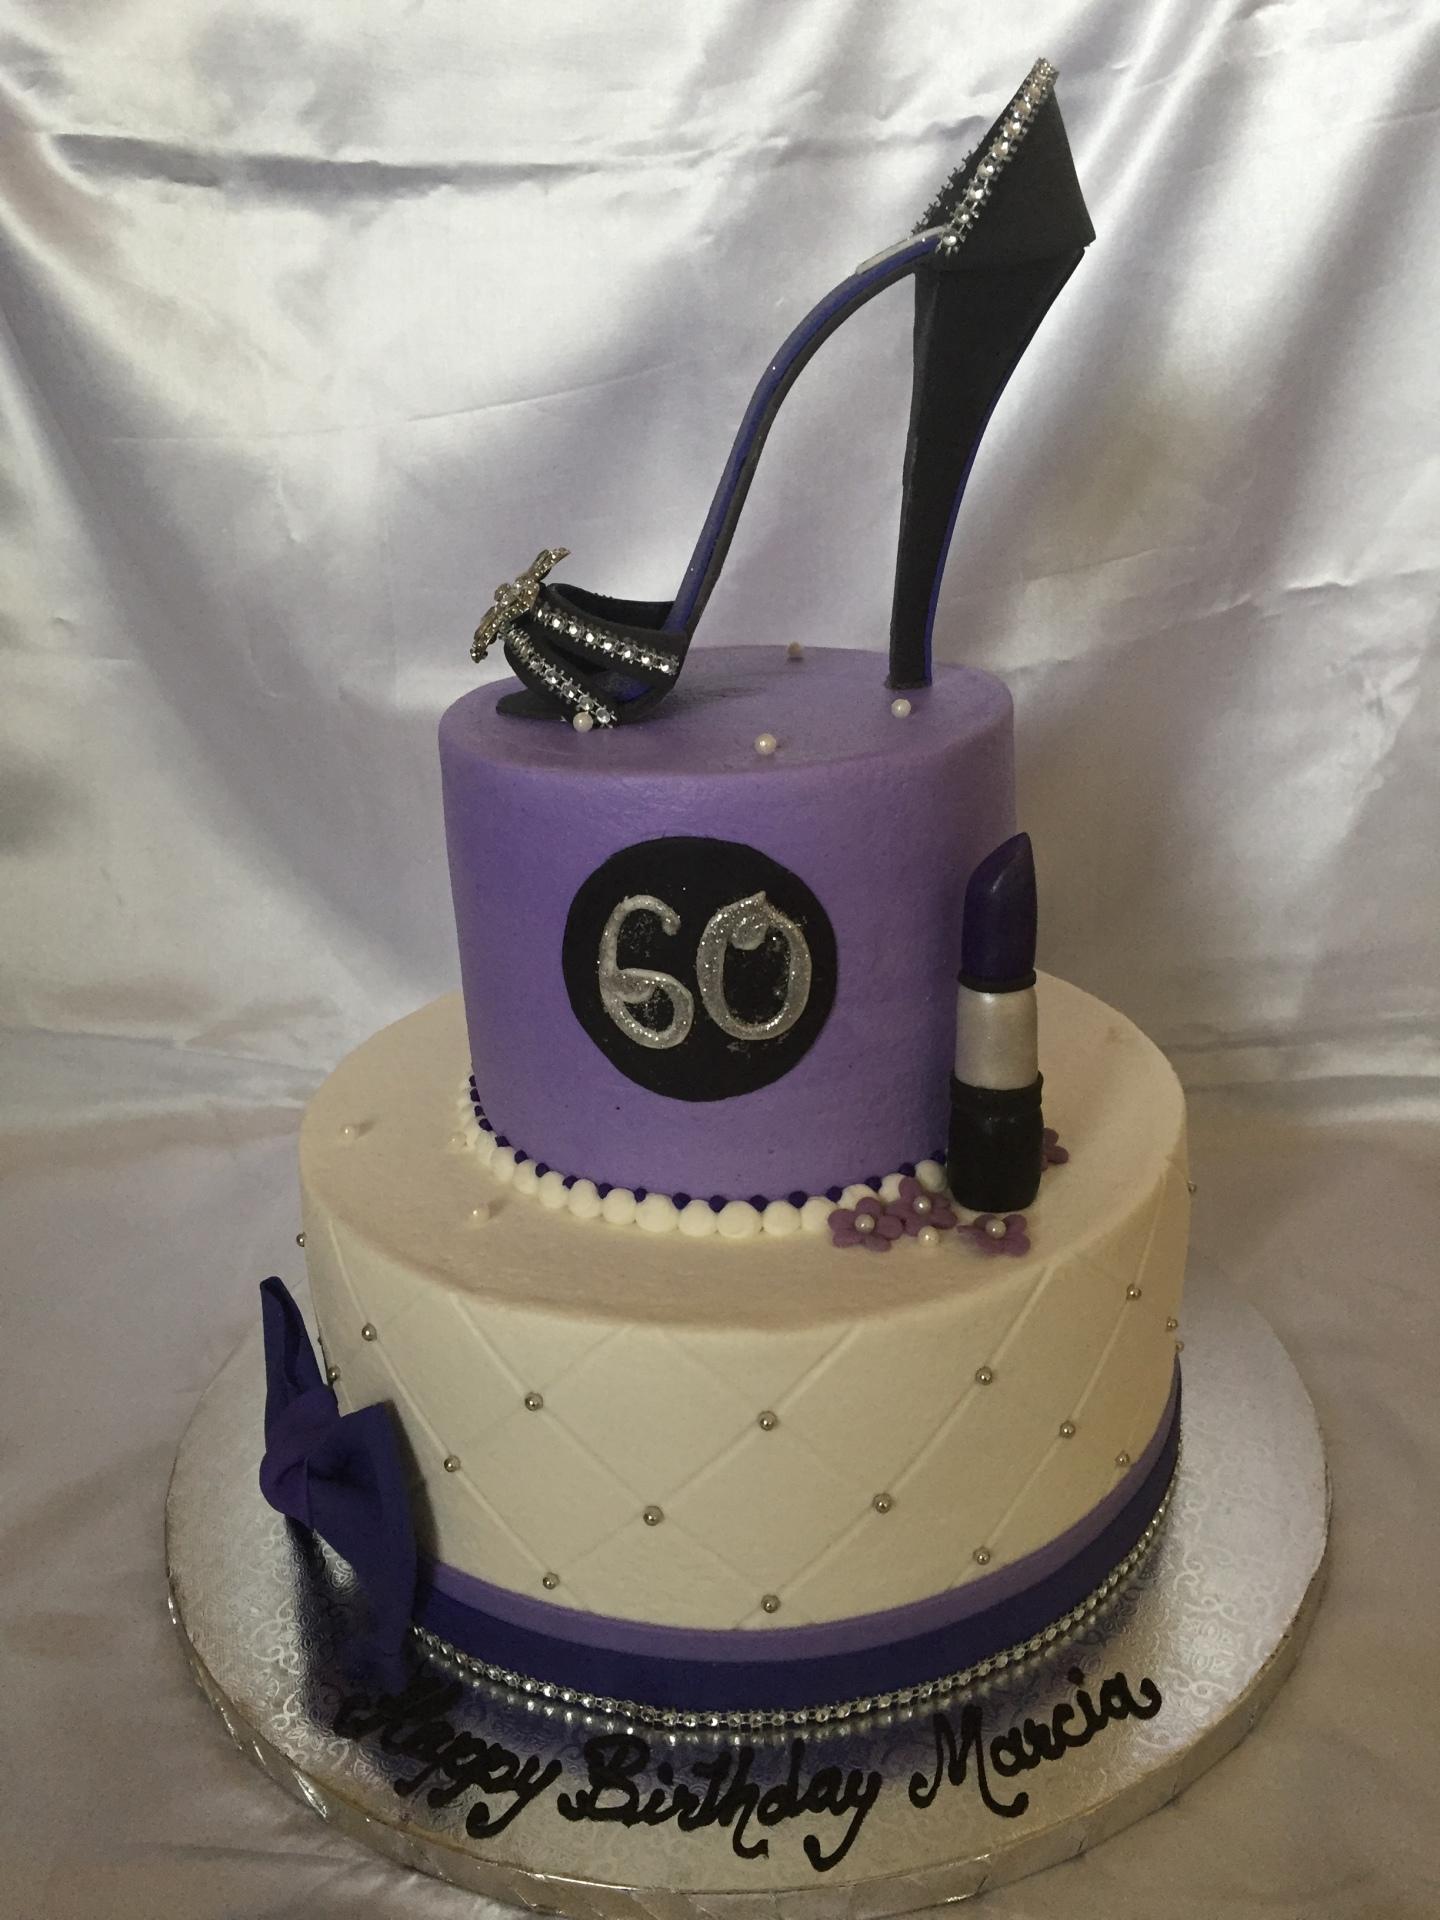 Black glam heel 2 tier white and purple